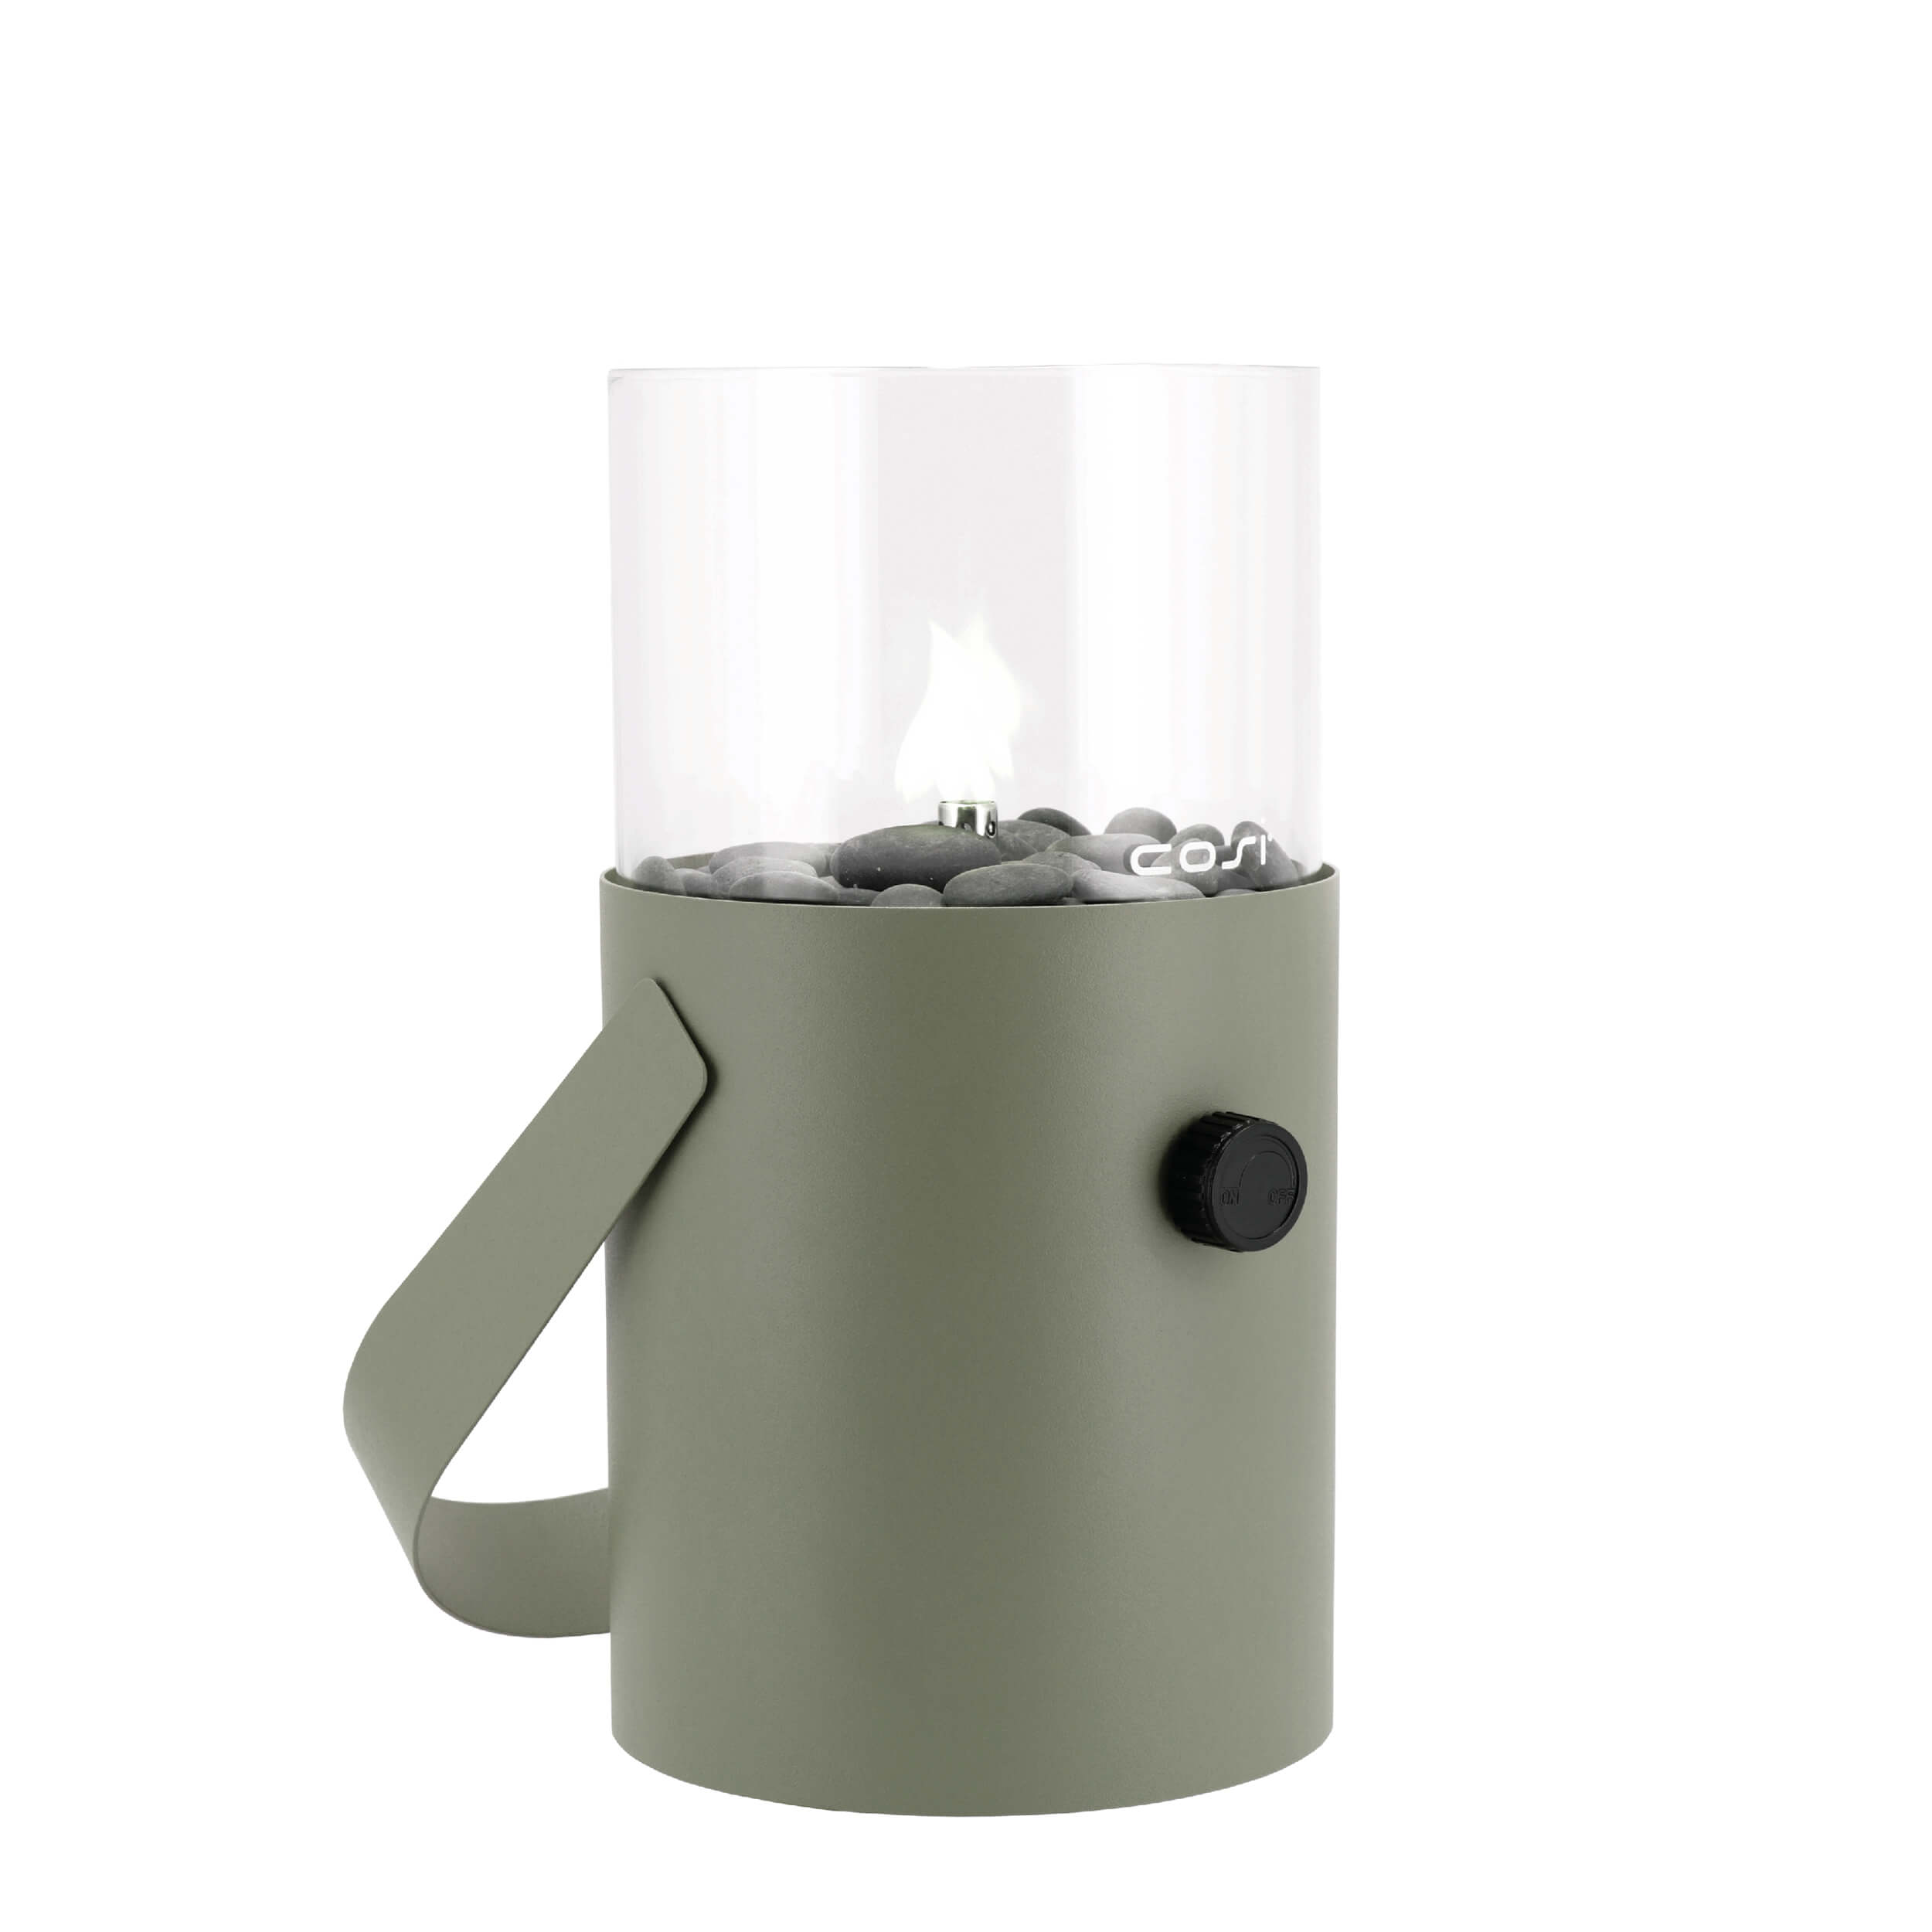 Cosiscoop Original – Olive